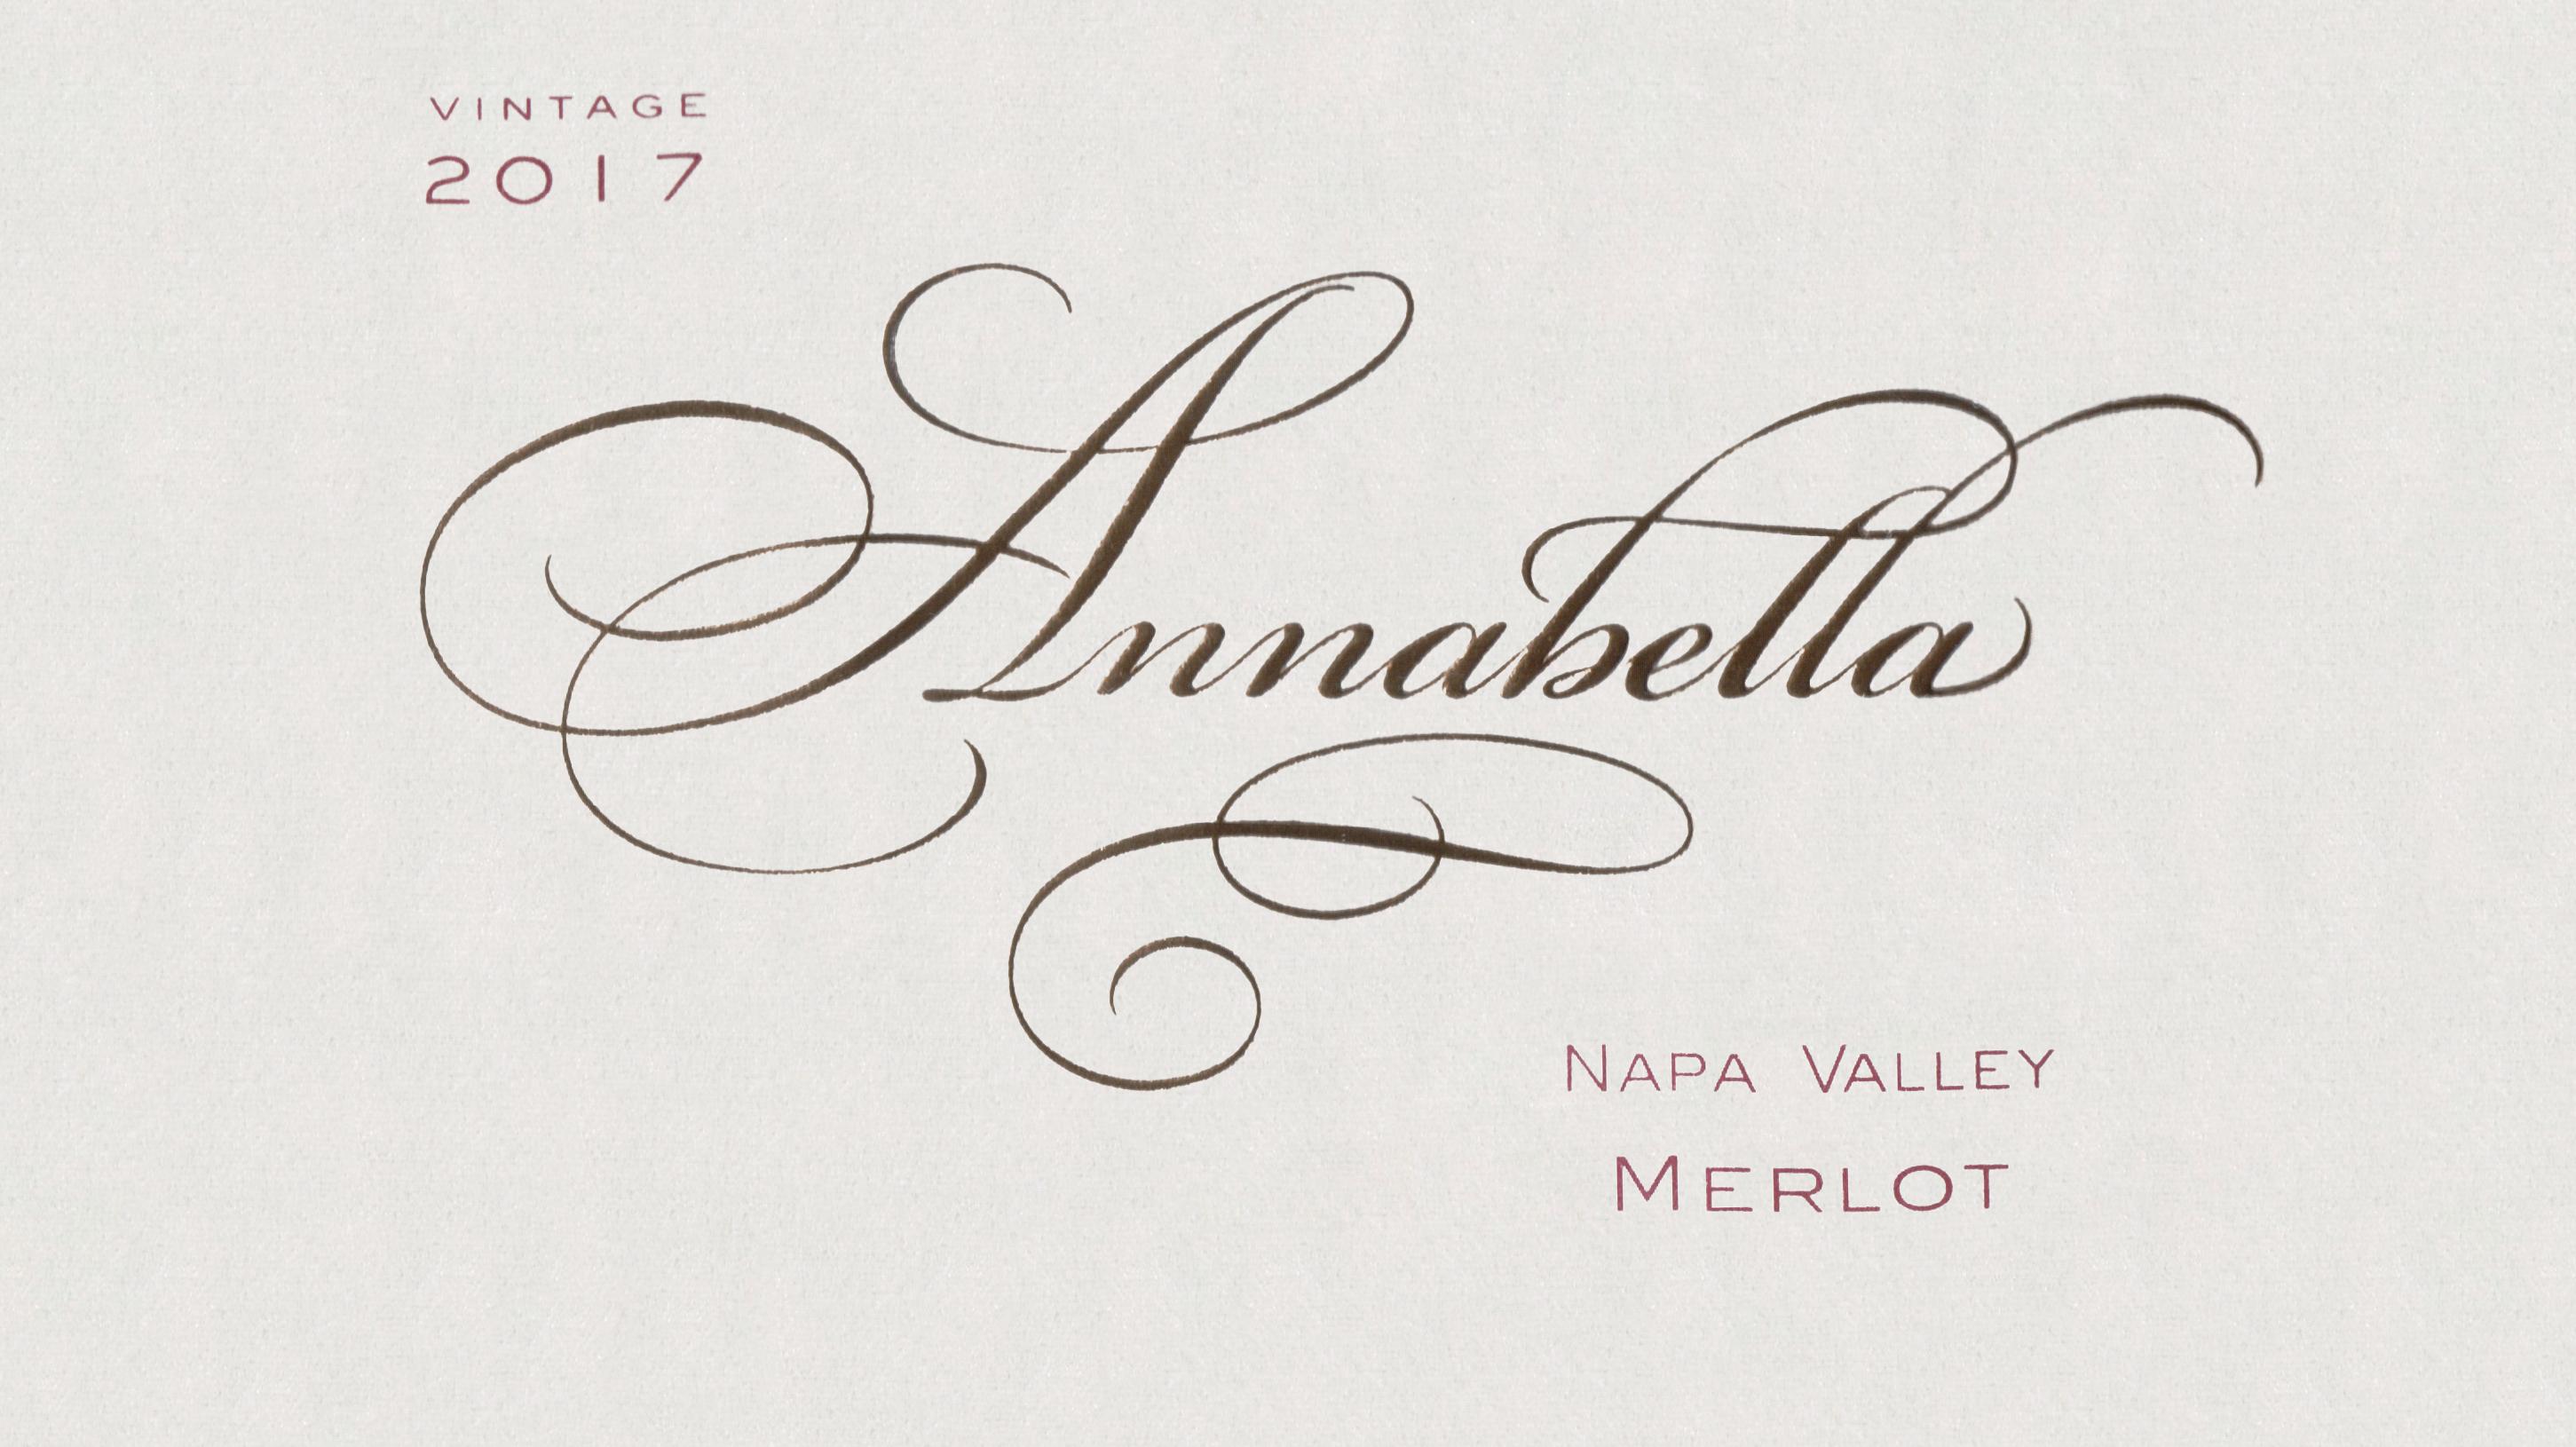 Annabella Merlot 2017